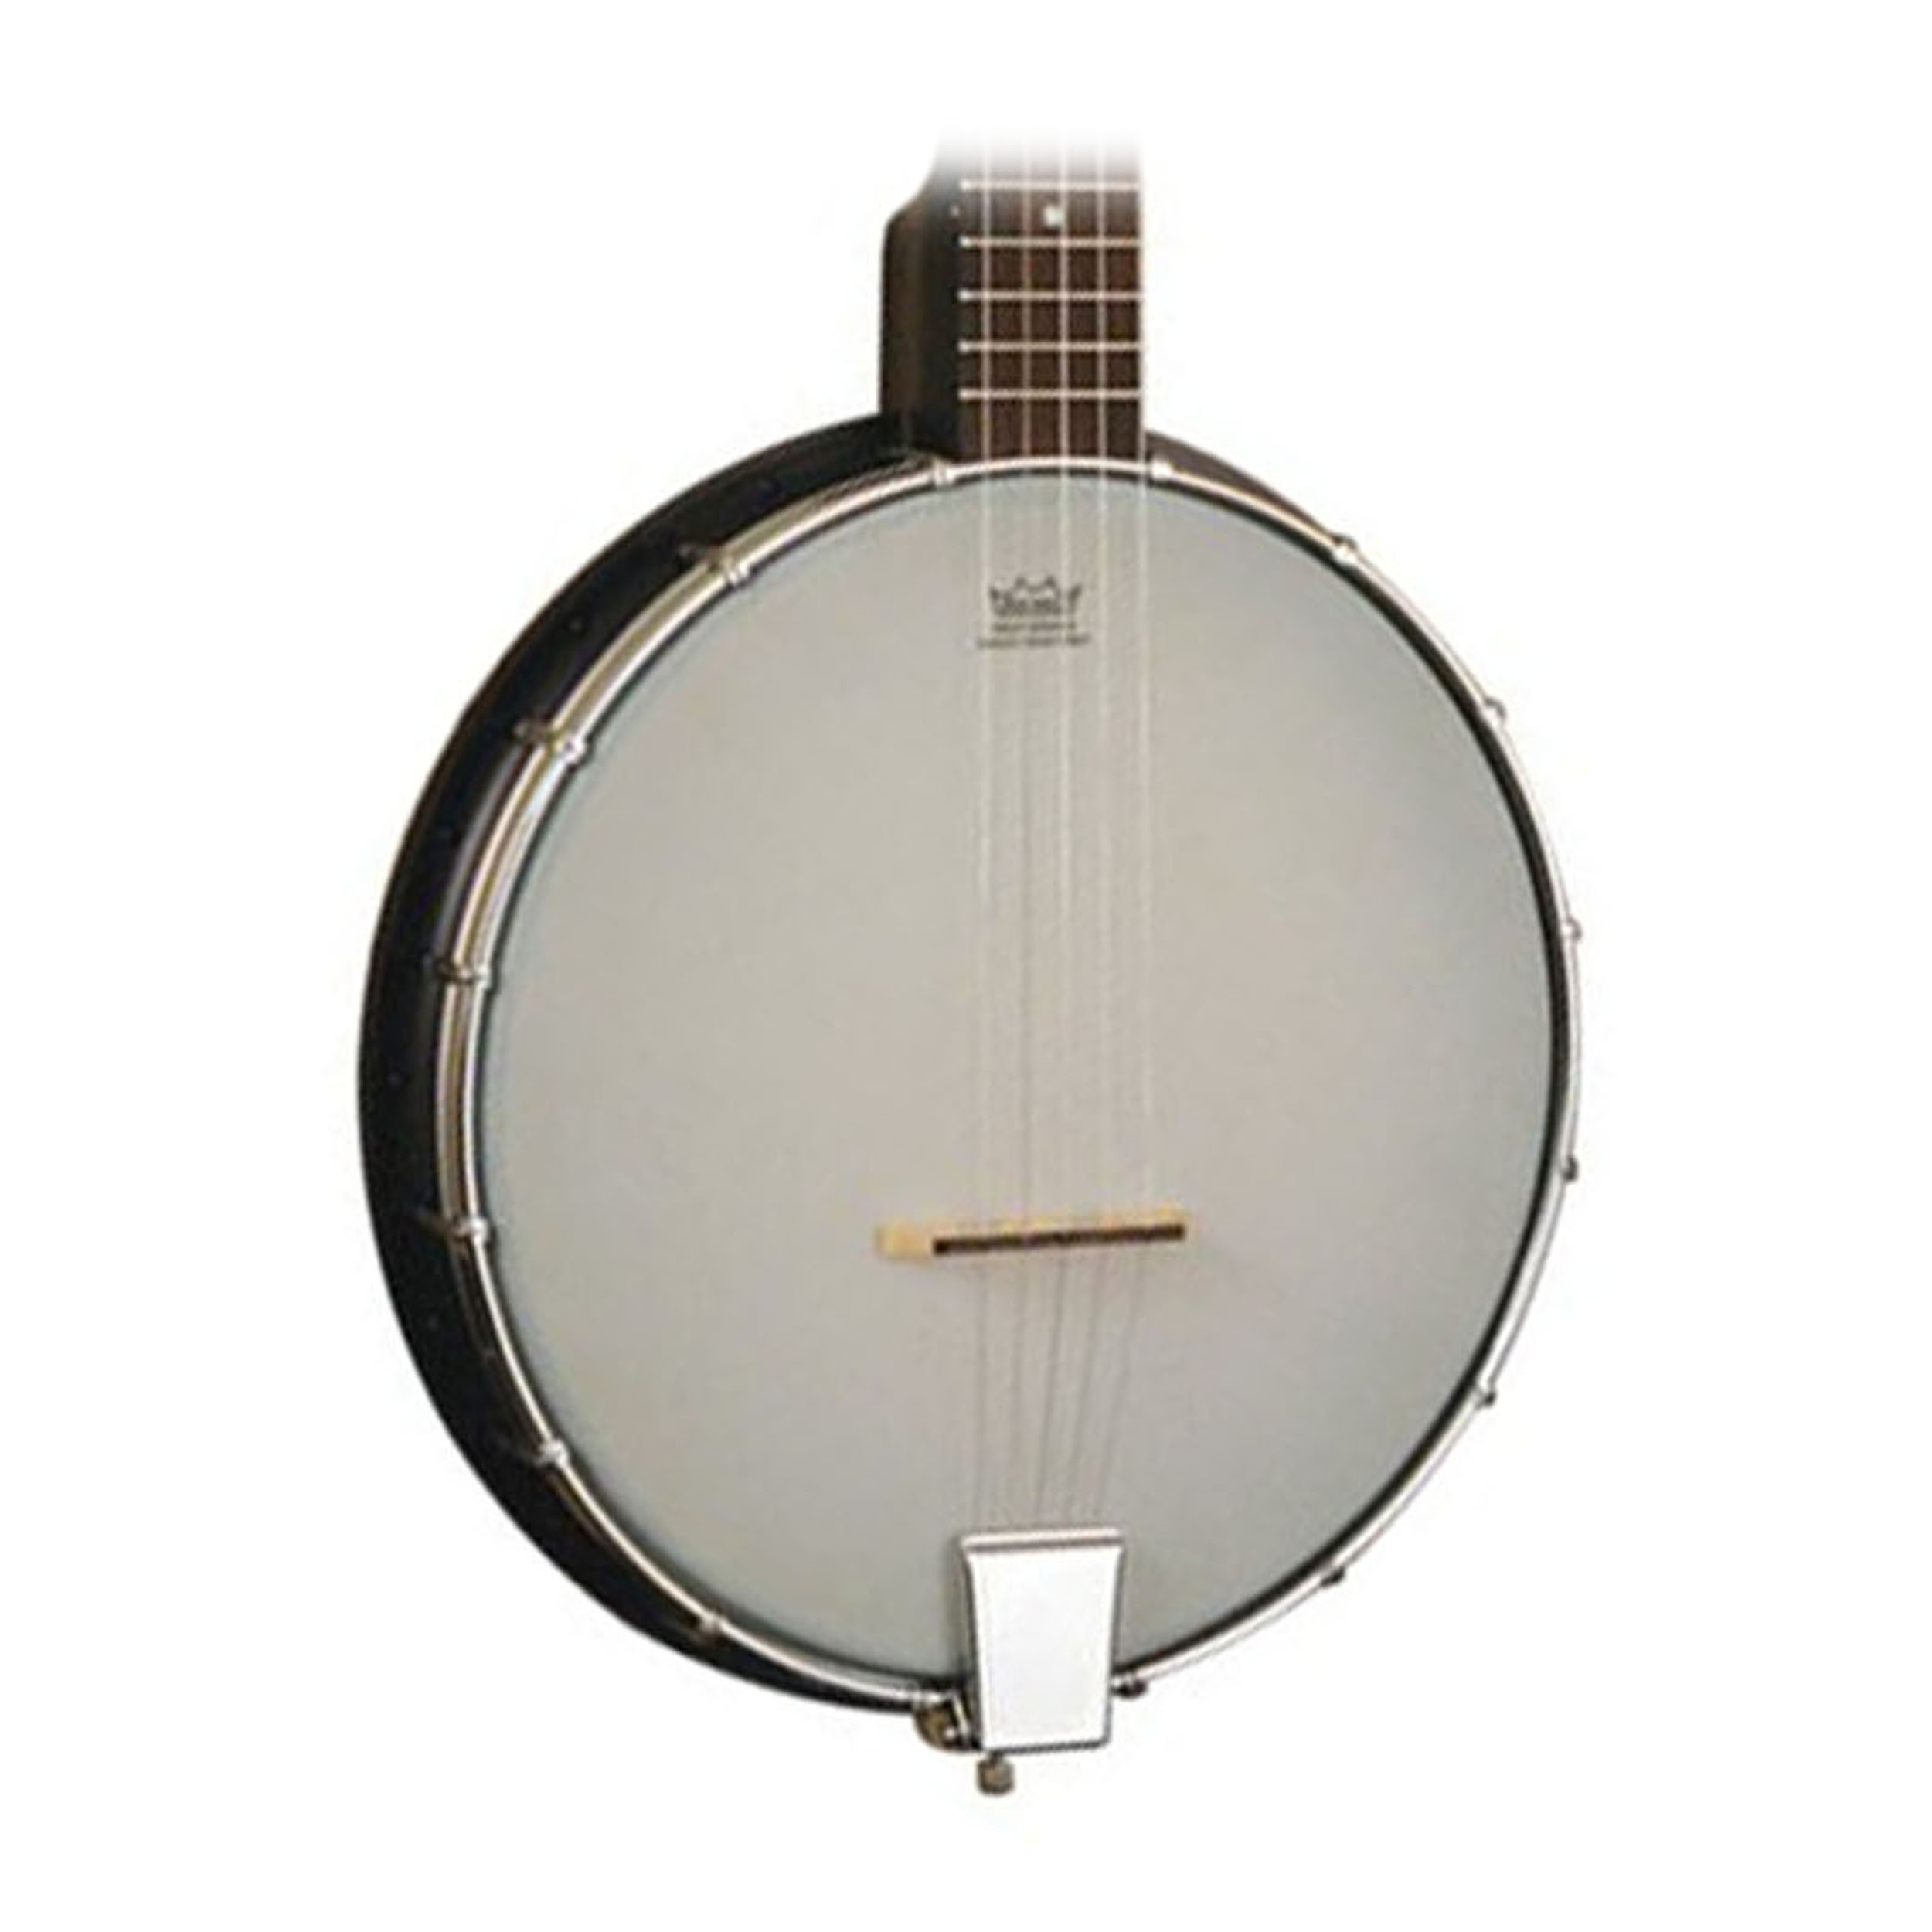 Gold Tone AC-1 Open-Back Banjo W/Gig Bag